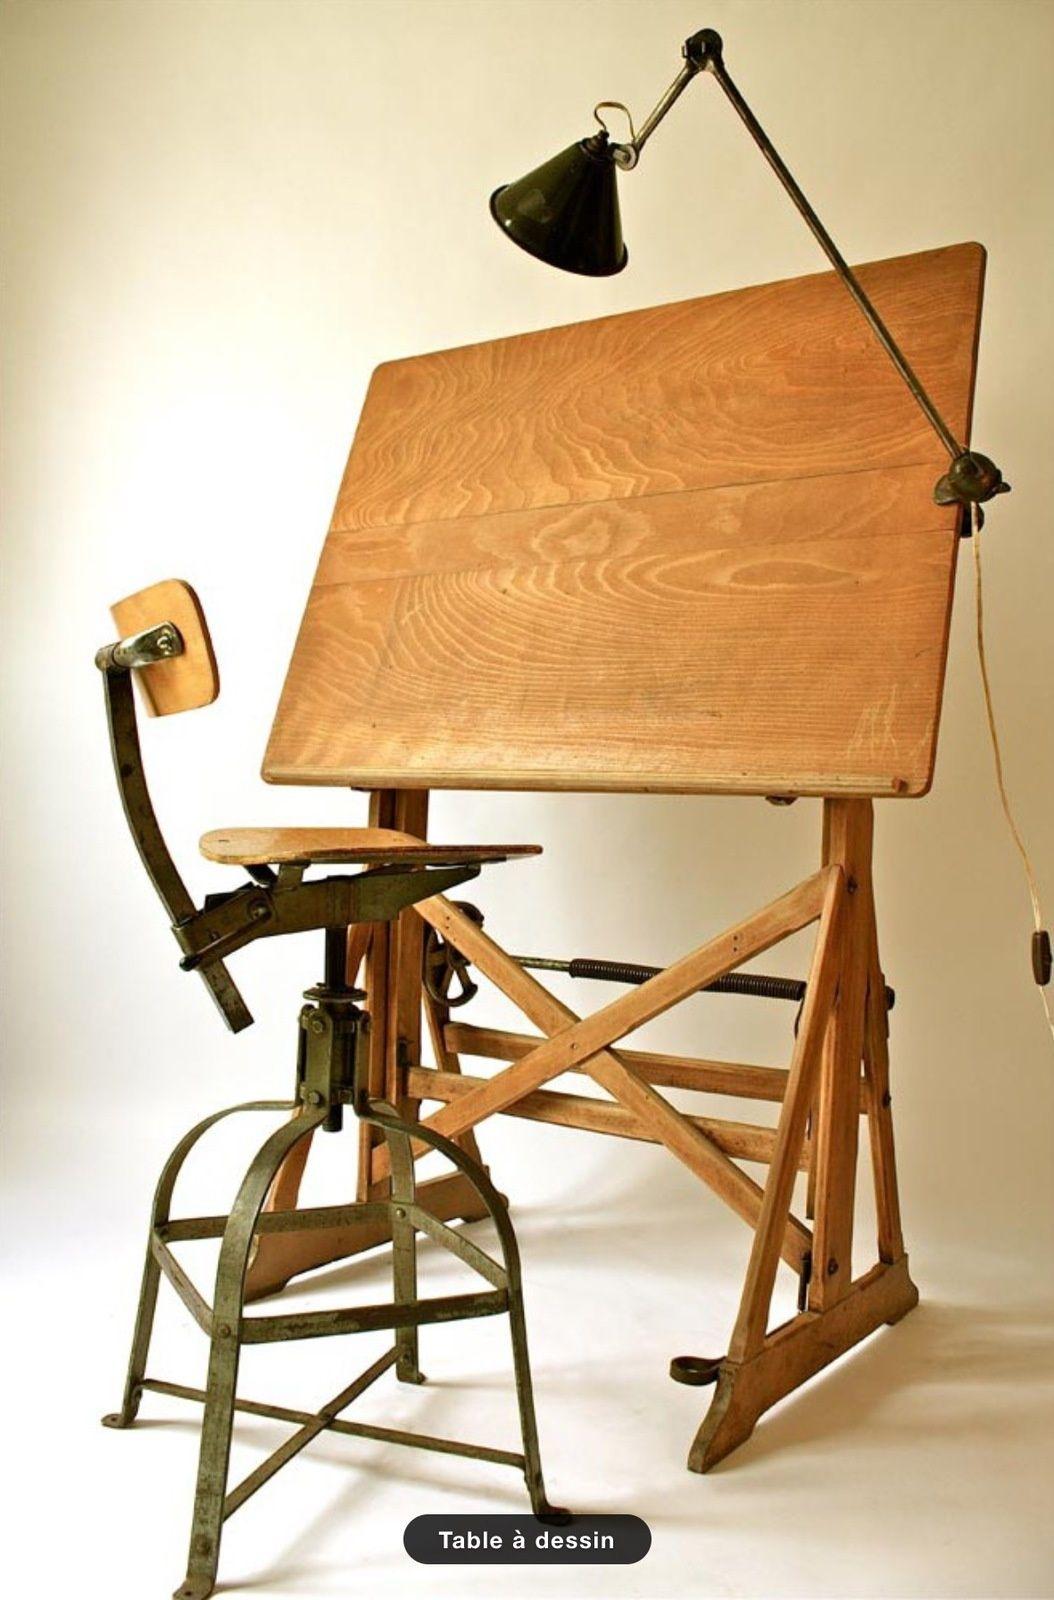 table a dessin ancienne darnay vers 1900 en bois it39s. Black Bedroom Furniture Sets. Home Design Ideas